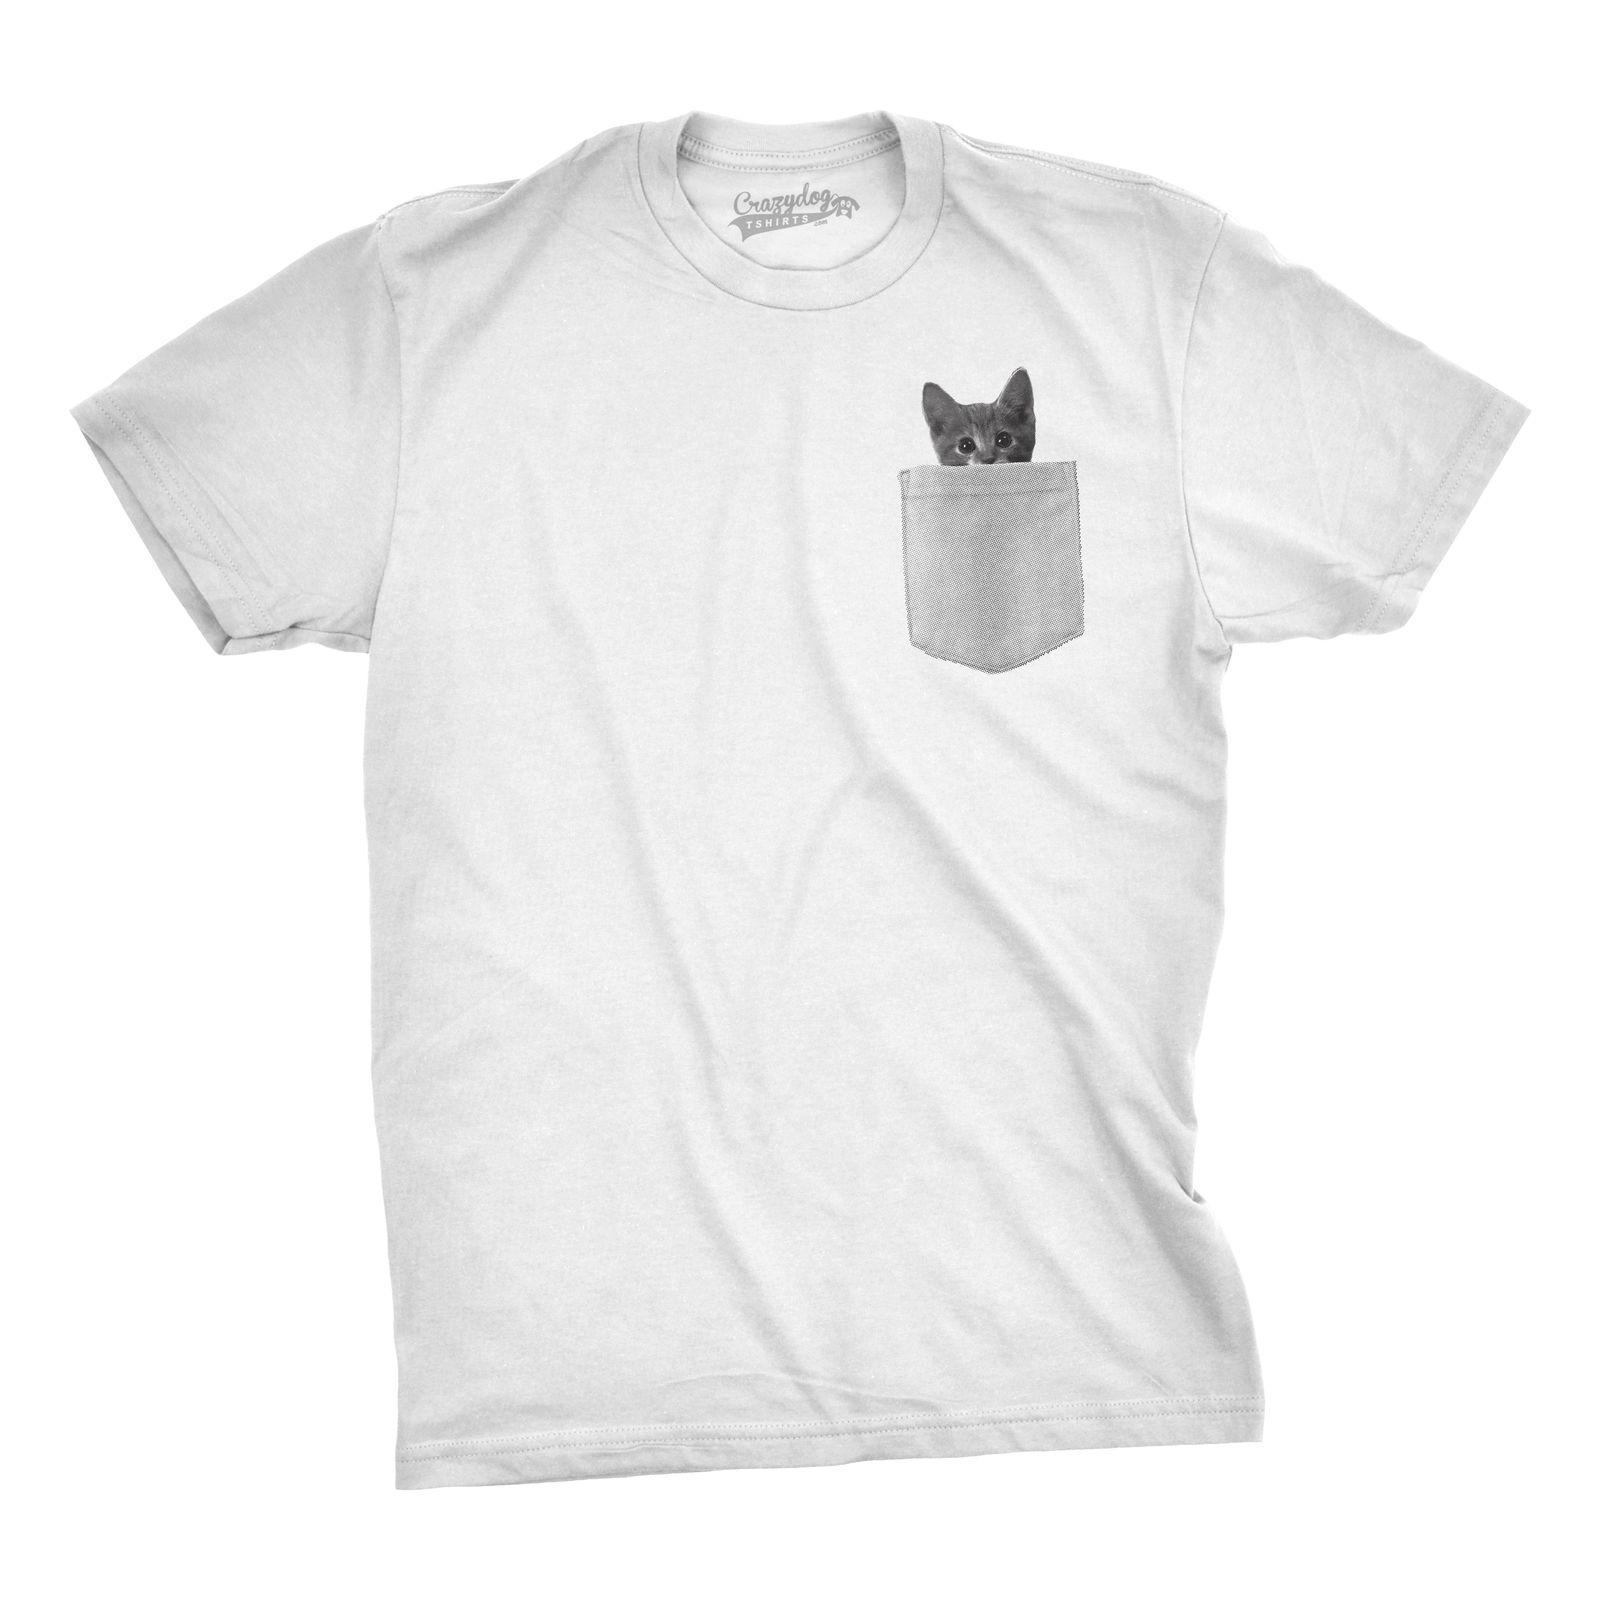 b602e484 Mens Pocket Cat T Shirt Funny Printed Peeking Pet Kitten Animal Tee For  Guys Men Women Unisex Fashion Tshirt Fun Shirts T Shirts Online Shopping  From ...